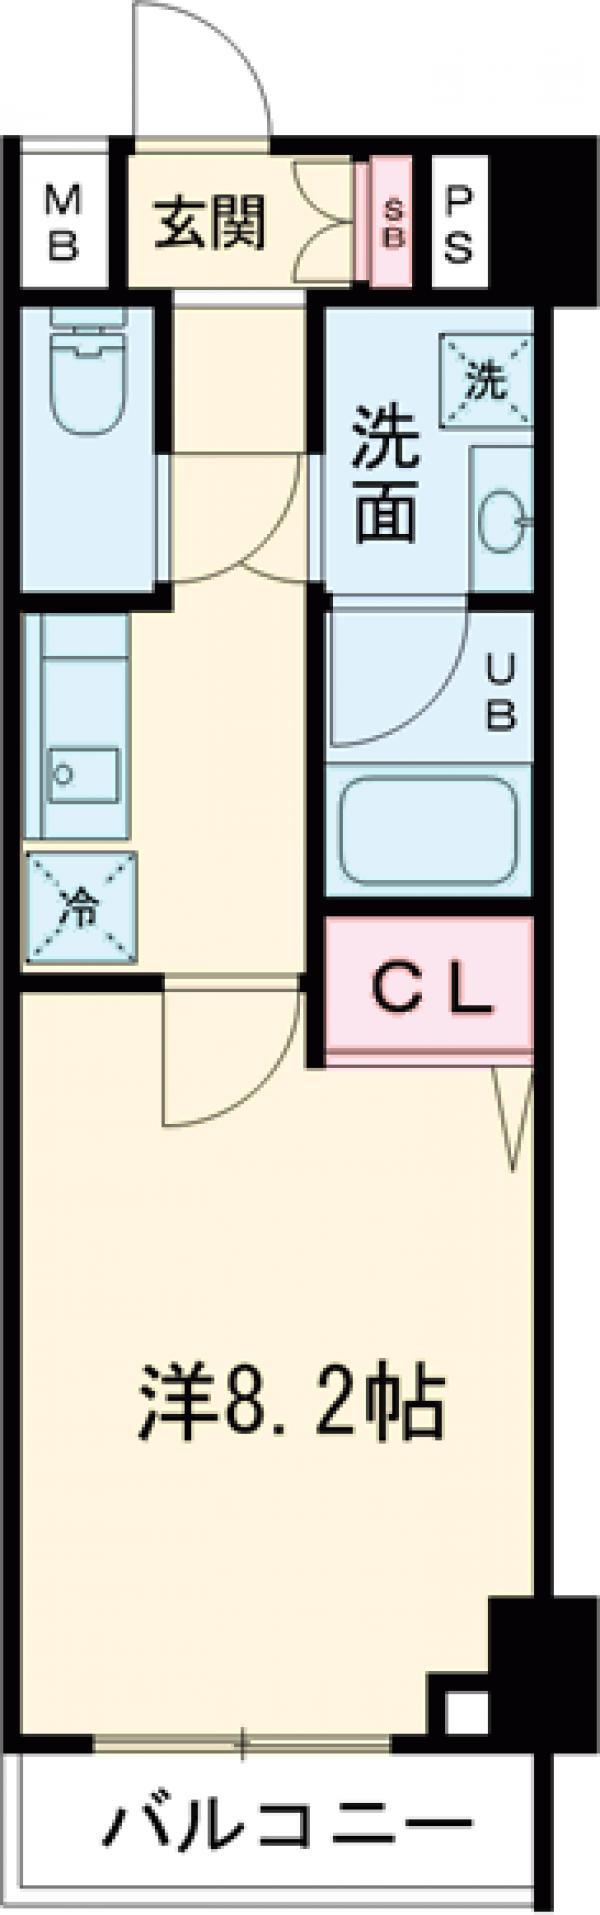 GENOVIA西高島平skygarden・803号室の間取り